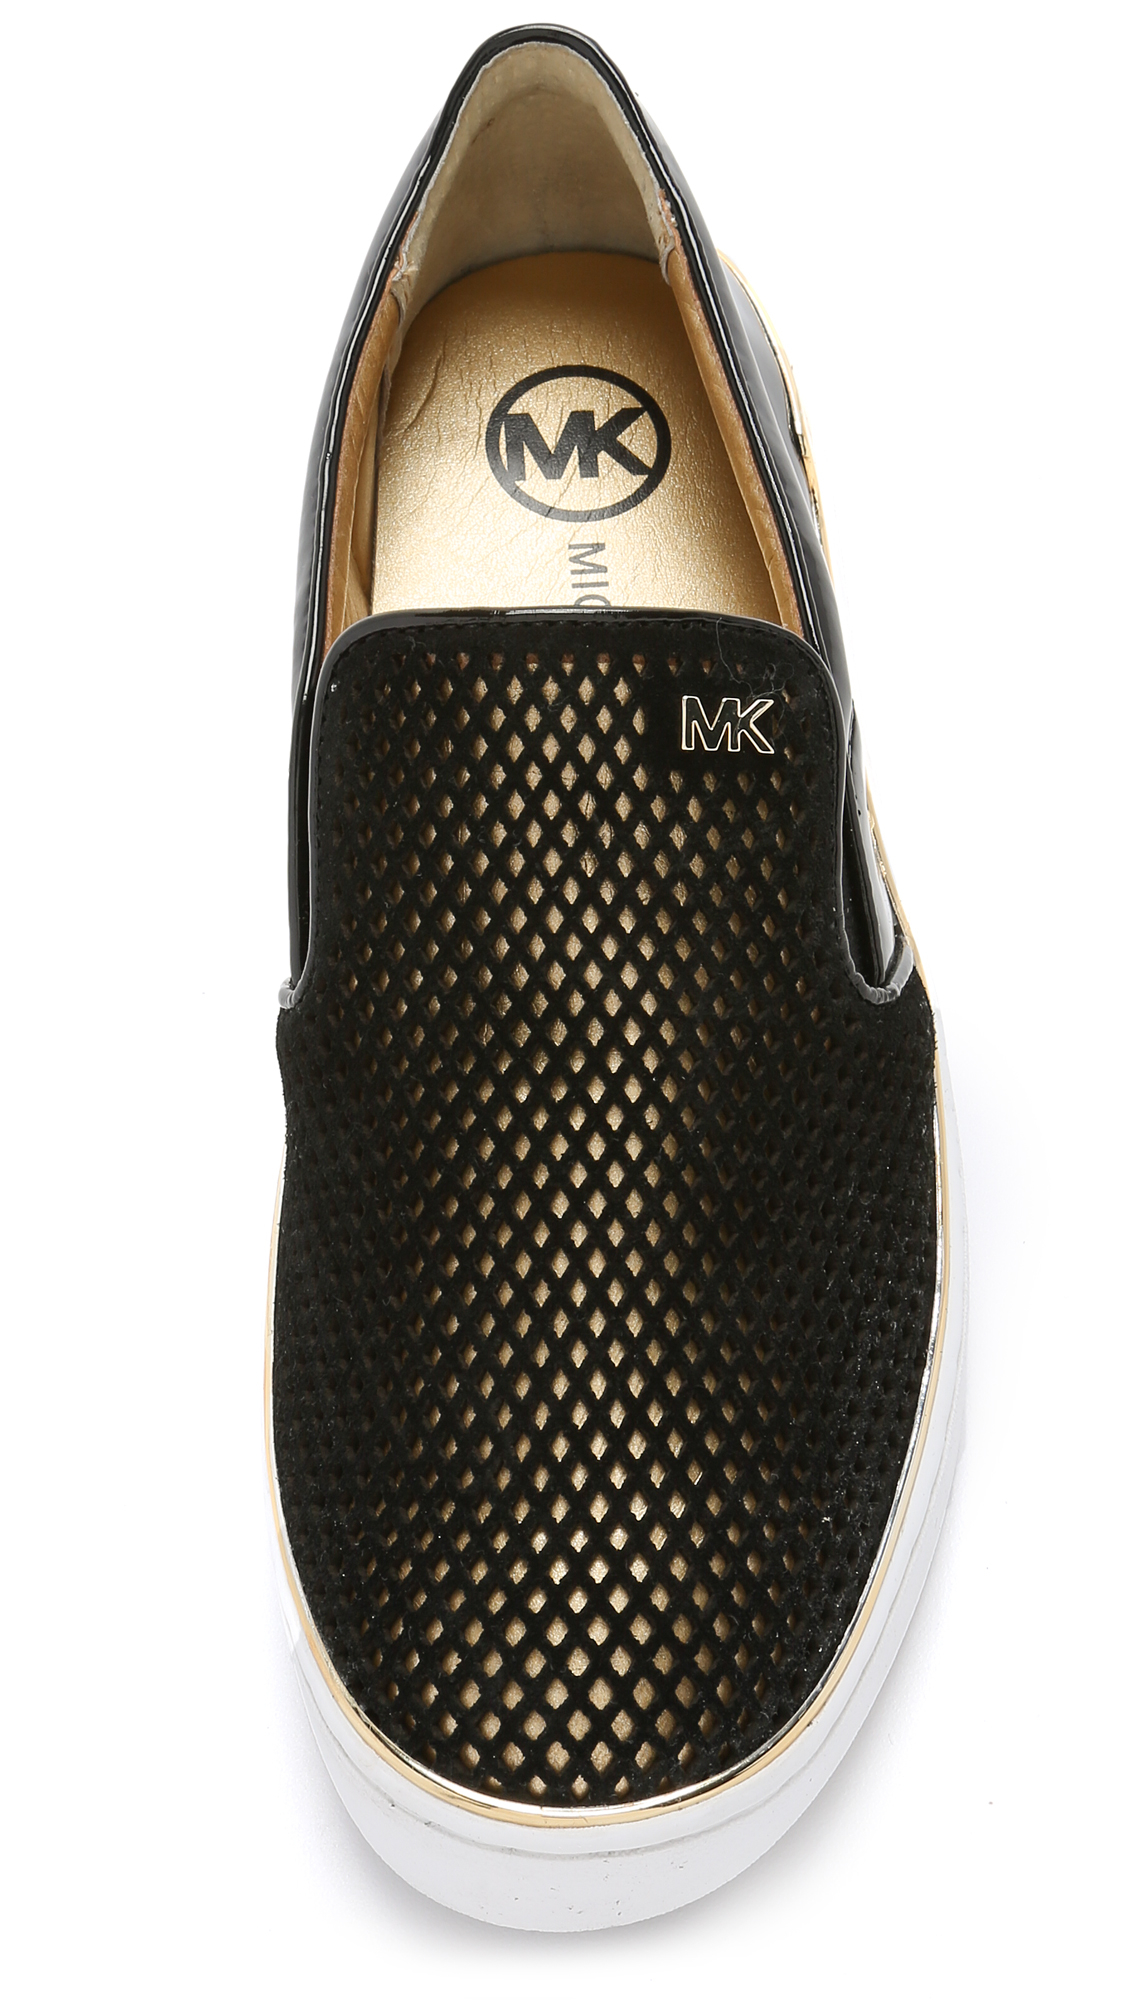 michael michael kors phoebe slip on sneakers black gold. Black Bedroom Furniture Sets. Home Design Ideas